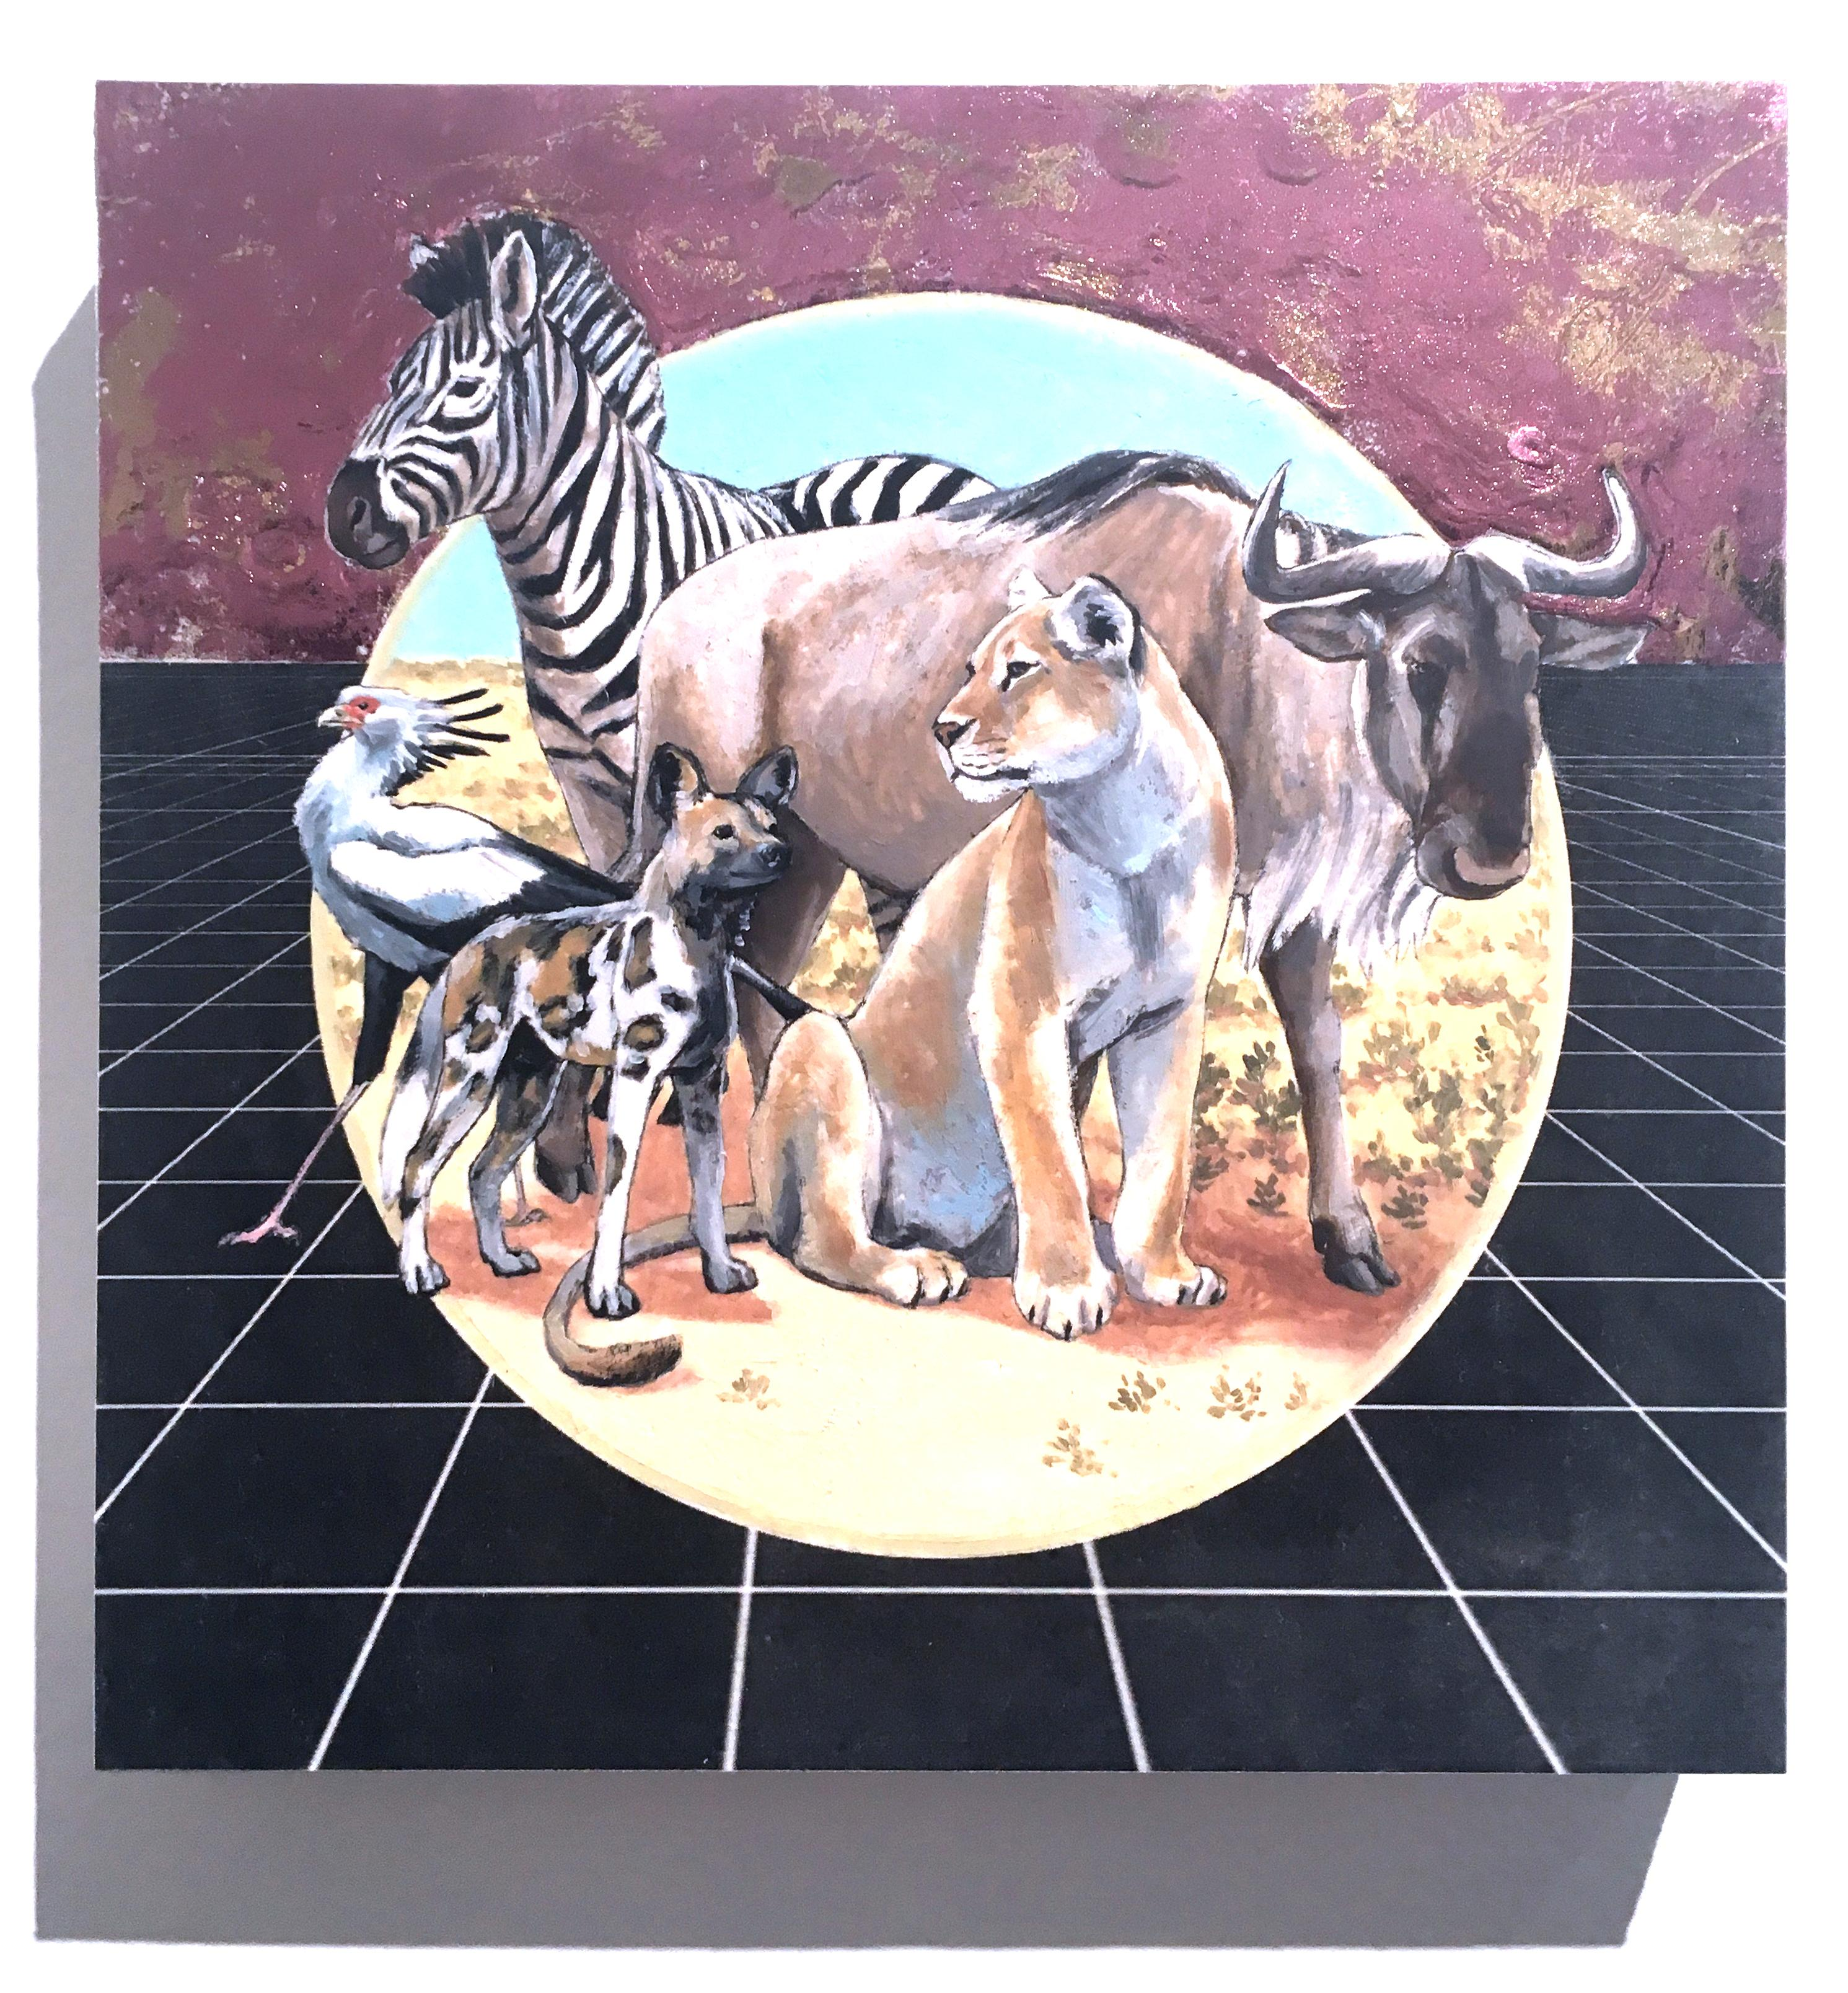 African Savanna, oil & metallic painting, figurative, animals, landscape